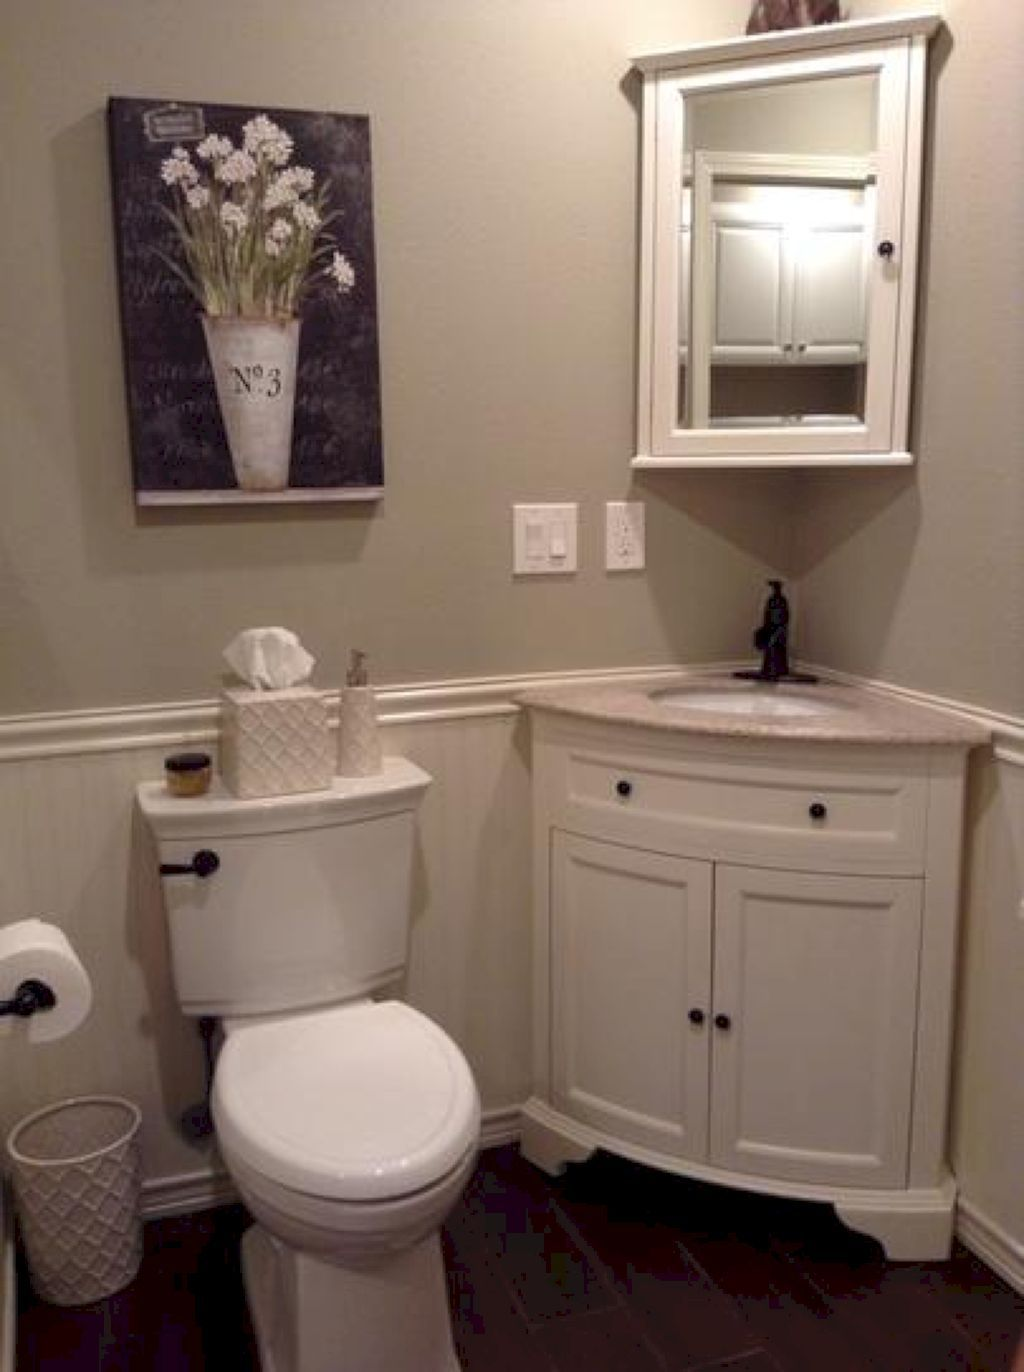 Adorable 60 Small Bathroom Remodel Ideas httpshomeylifecom60